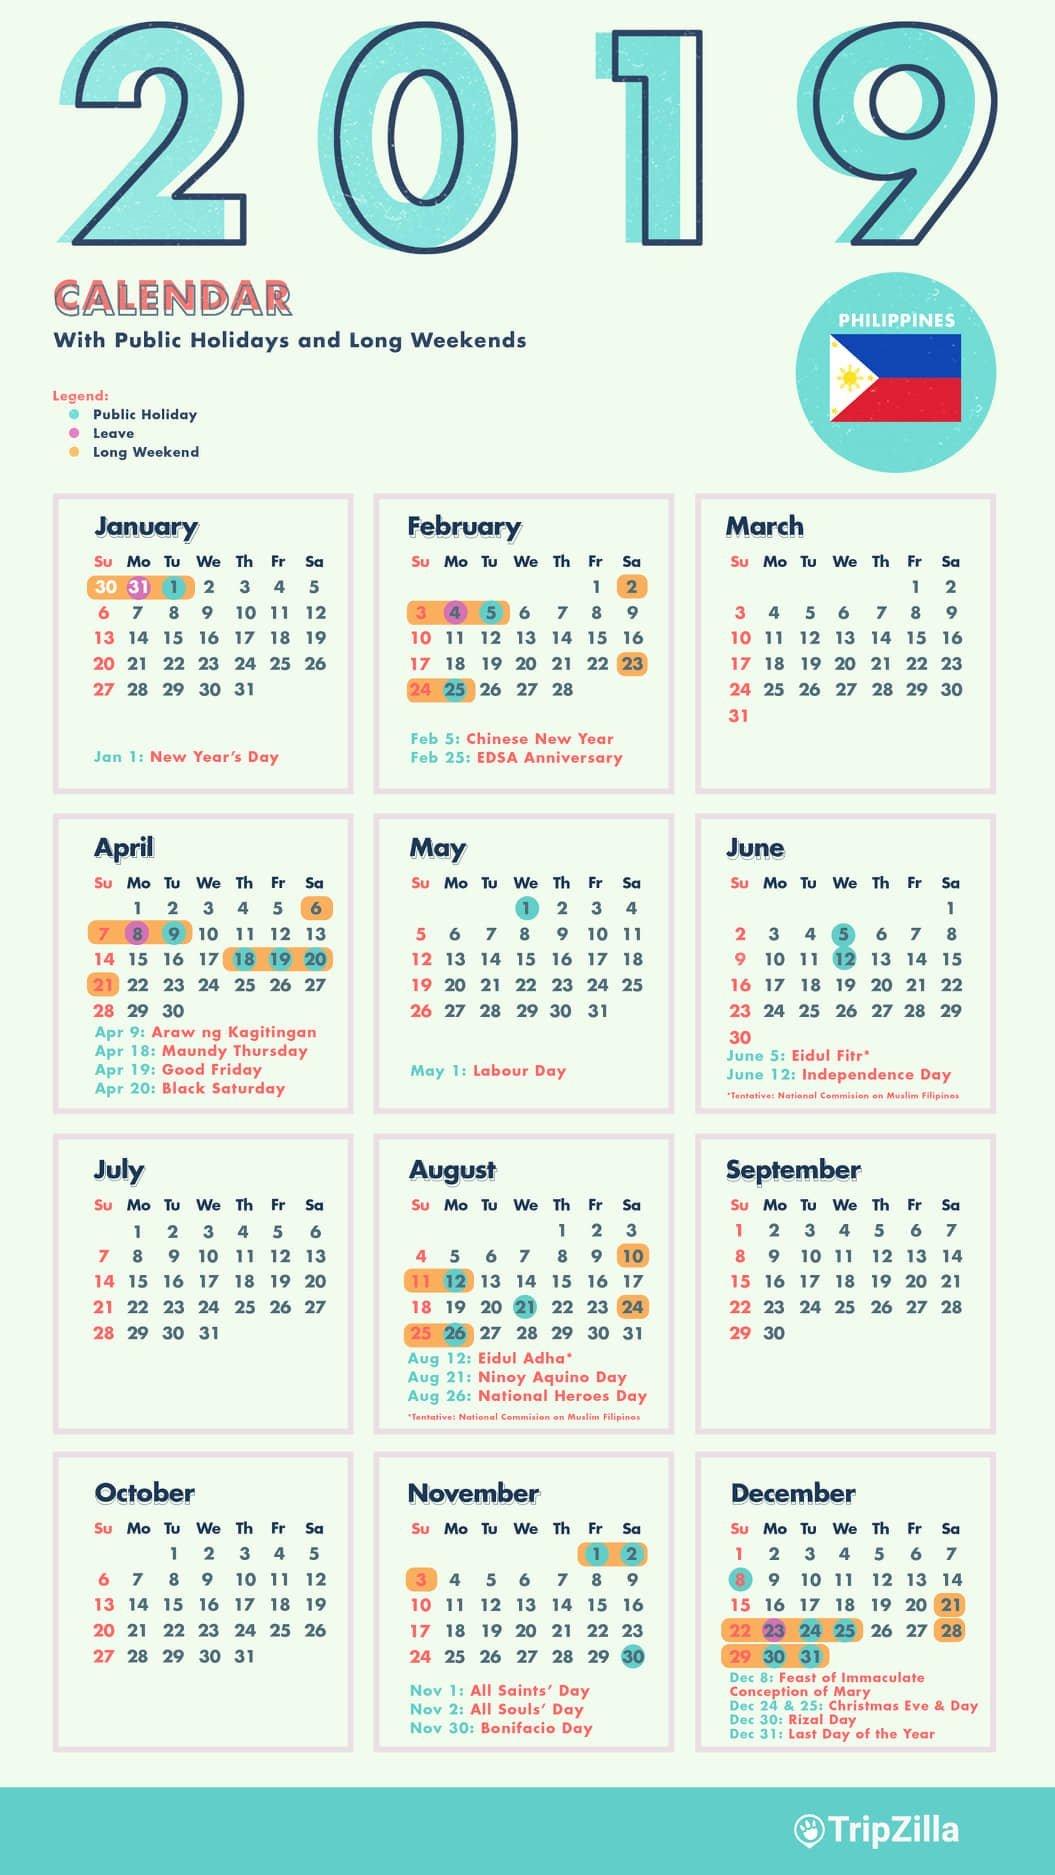 10 Long Weekends In The Philippines In 2019 With Calendar & Cheatsheet Feb 7 2019 Calendar